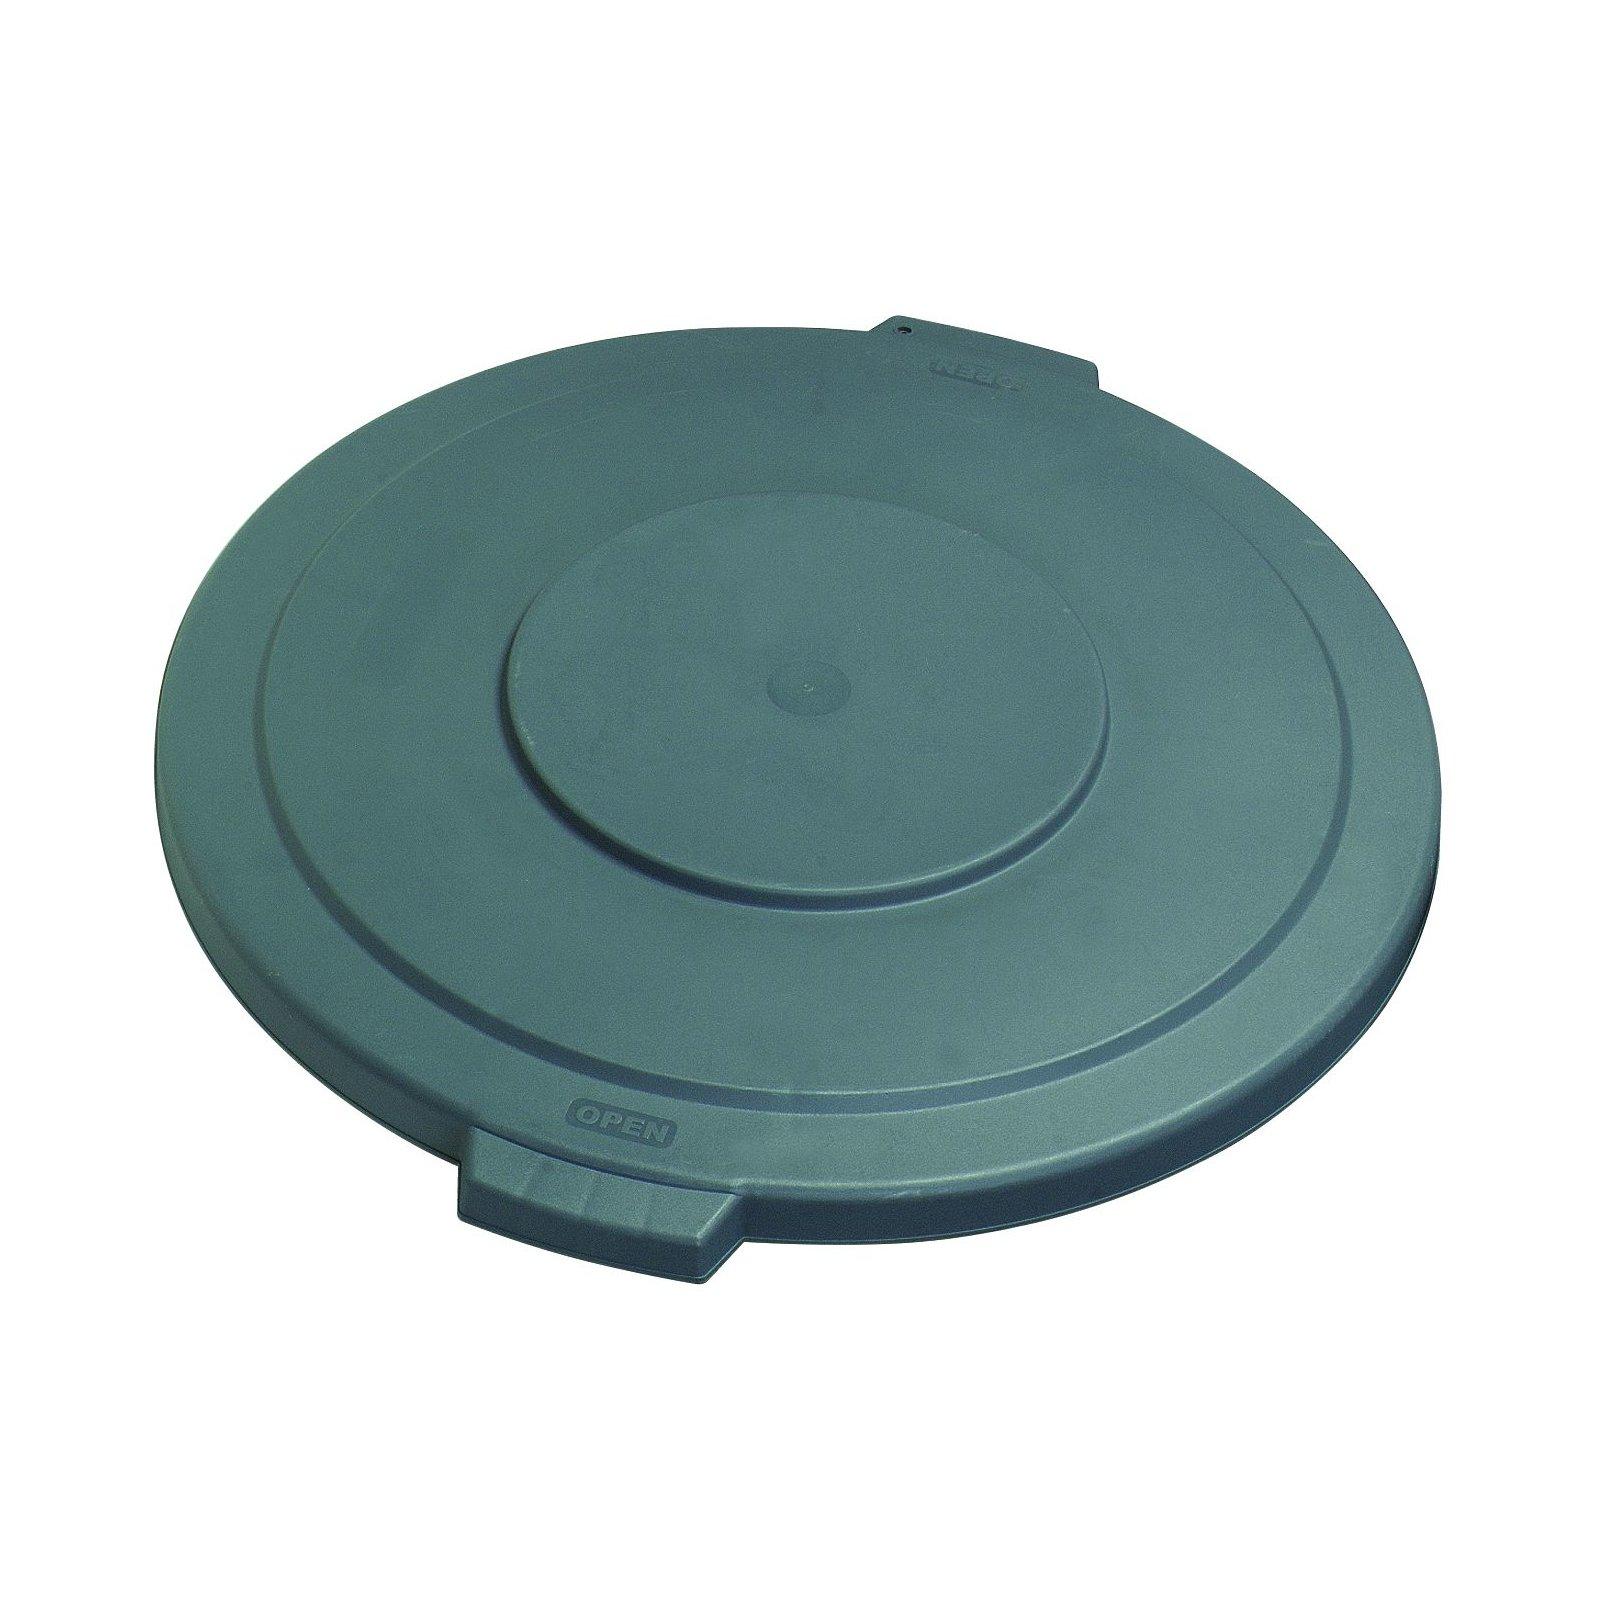 34103323 - Bronco™ Round Waste Bin Trash Container Lid 32 Gallon ...